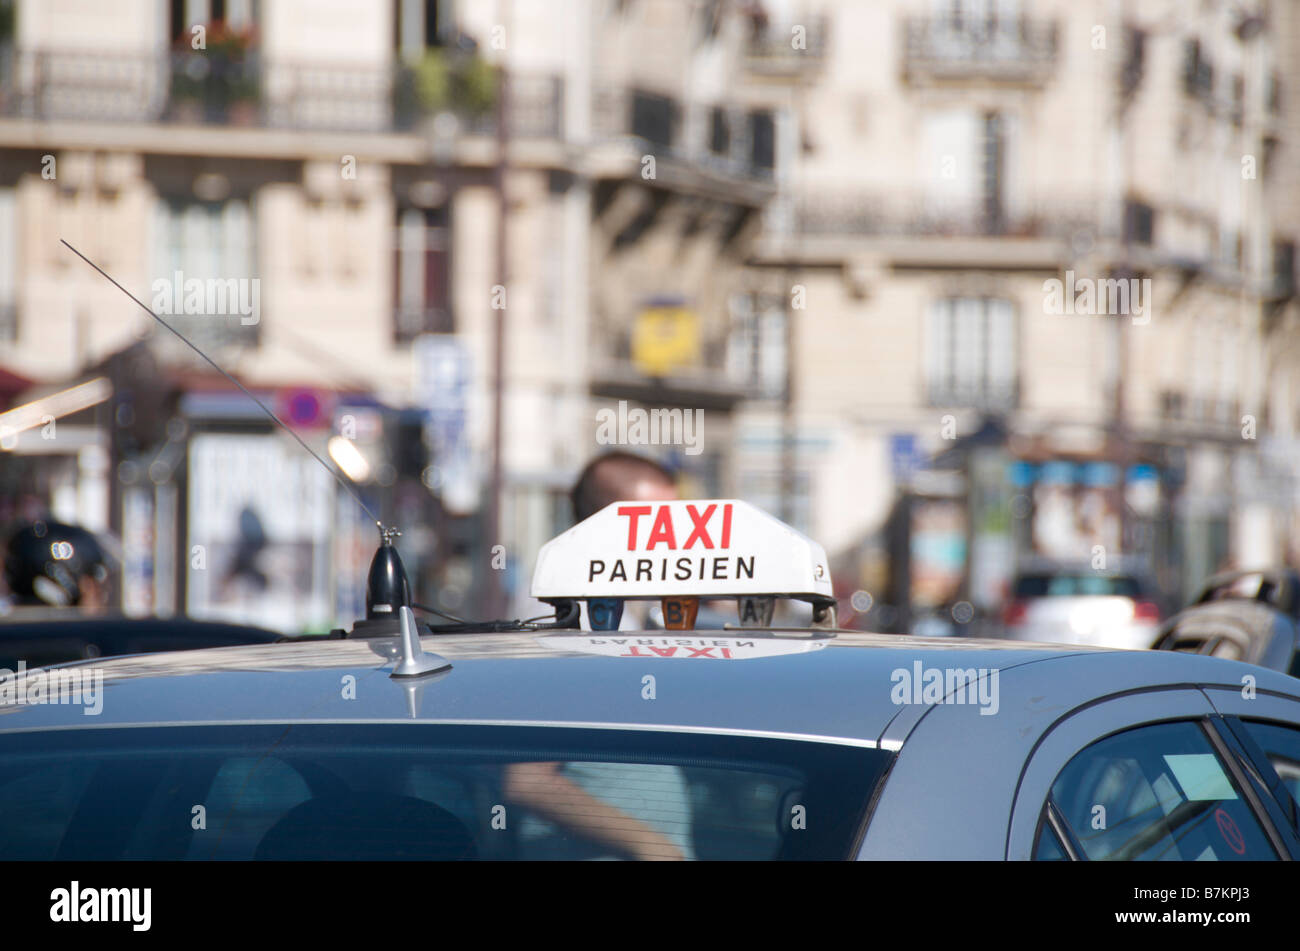 Taxi en Paris, Francia Imagen De Stock